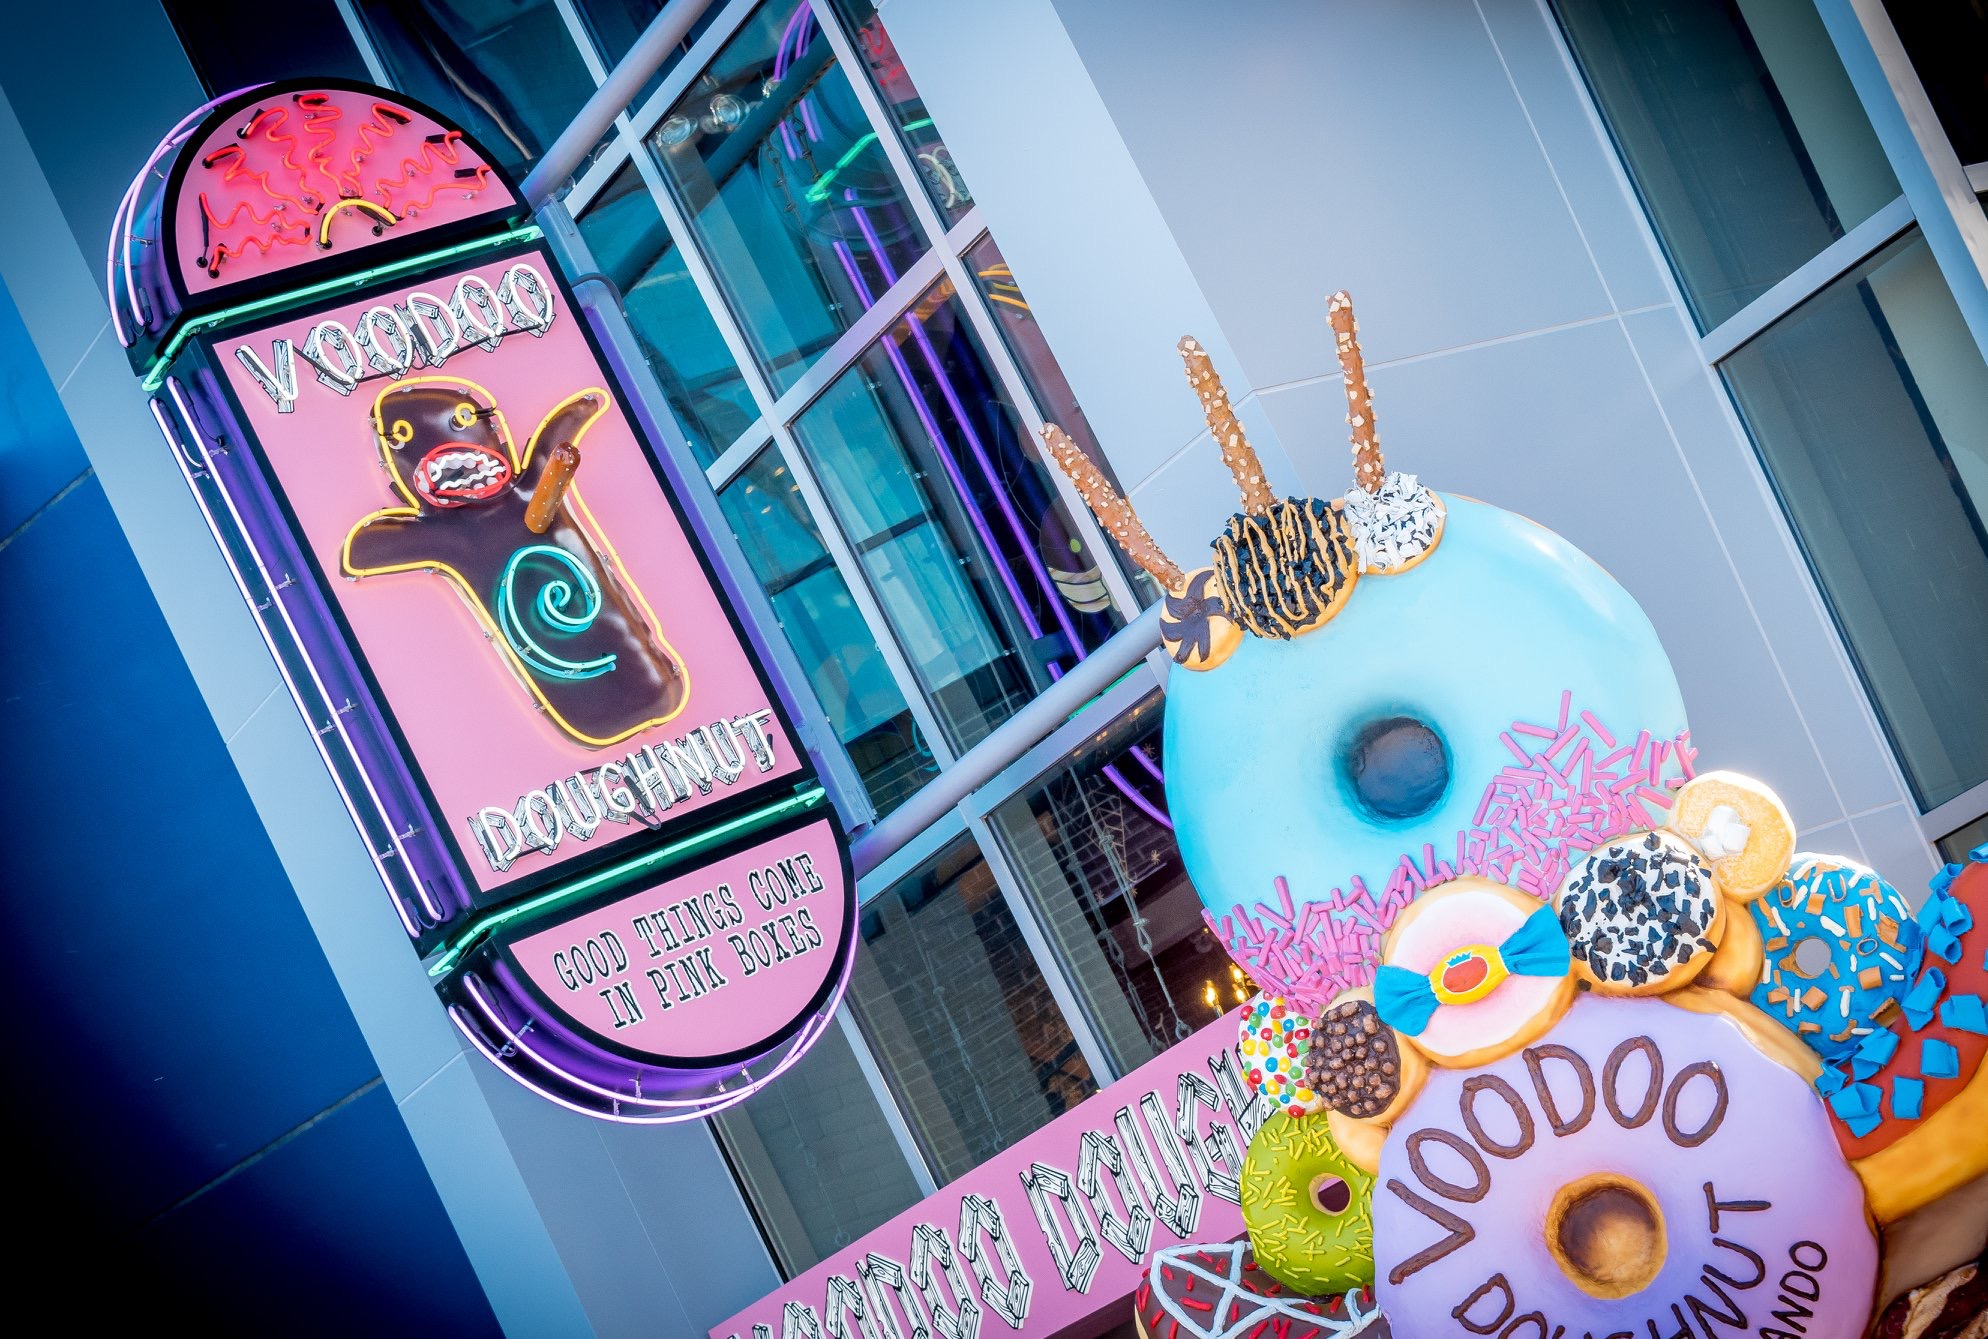 9ad2108d21bea SATURDAY SIX  6 Reasons We Love VOODOO DOUGHNUT at Universal CityWalk